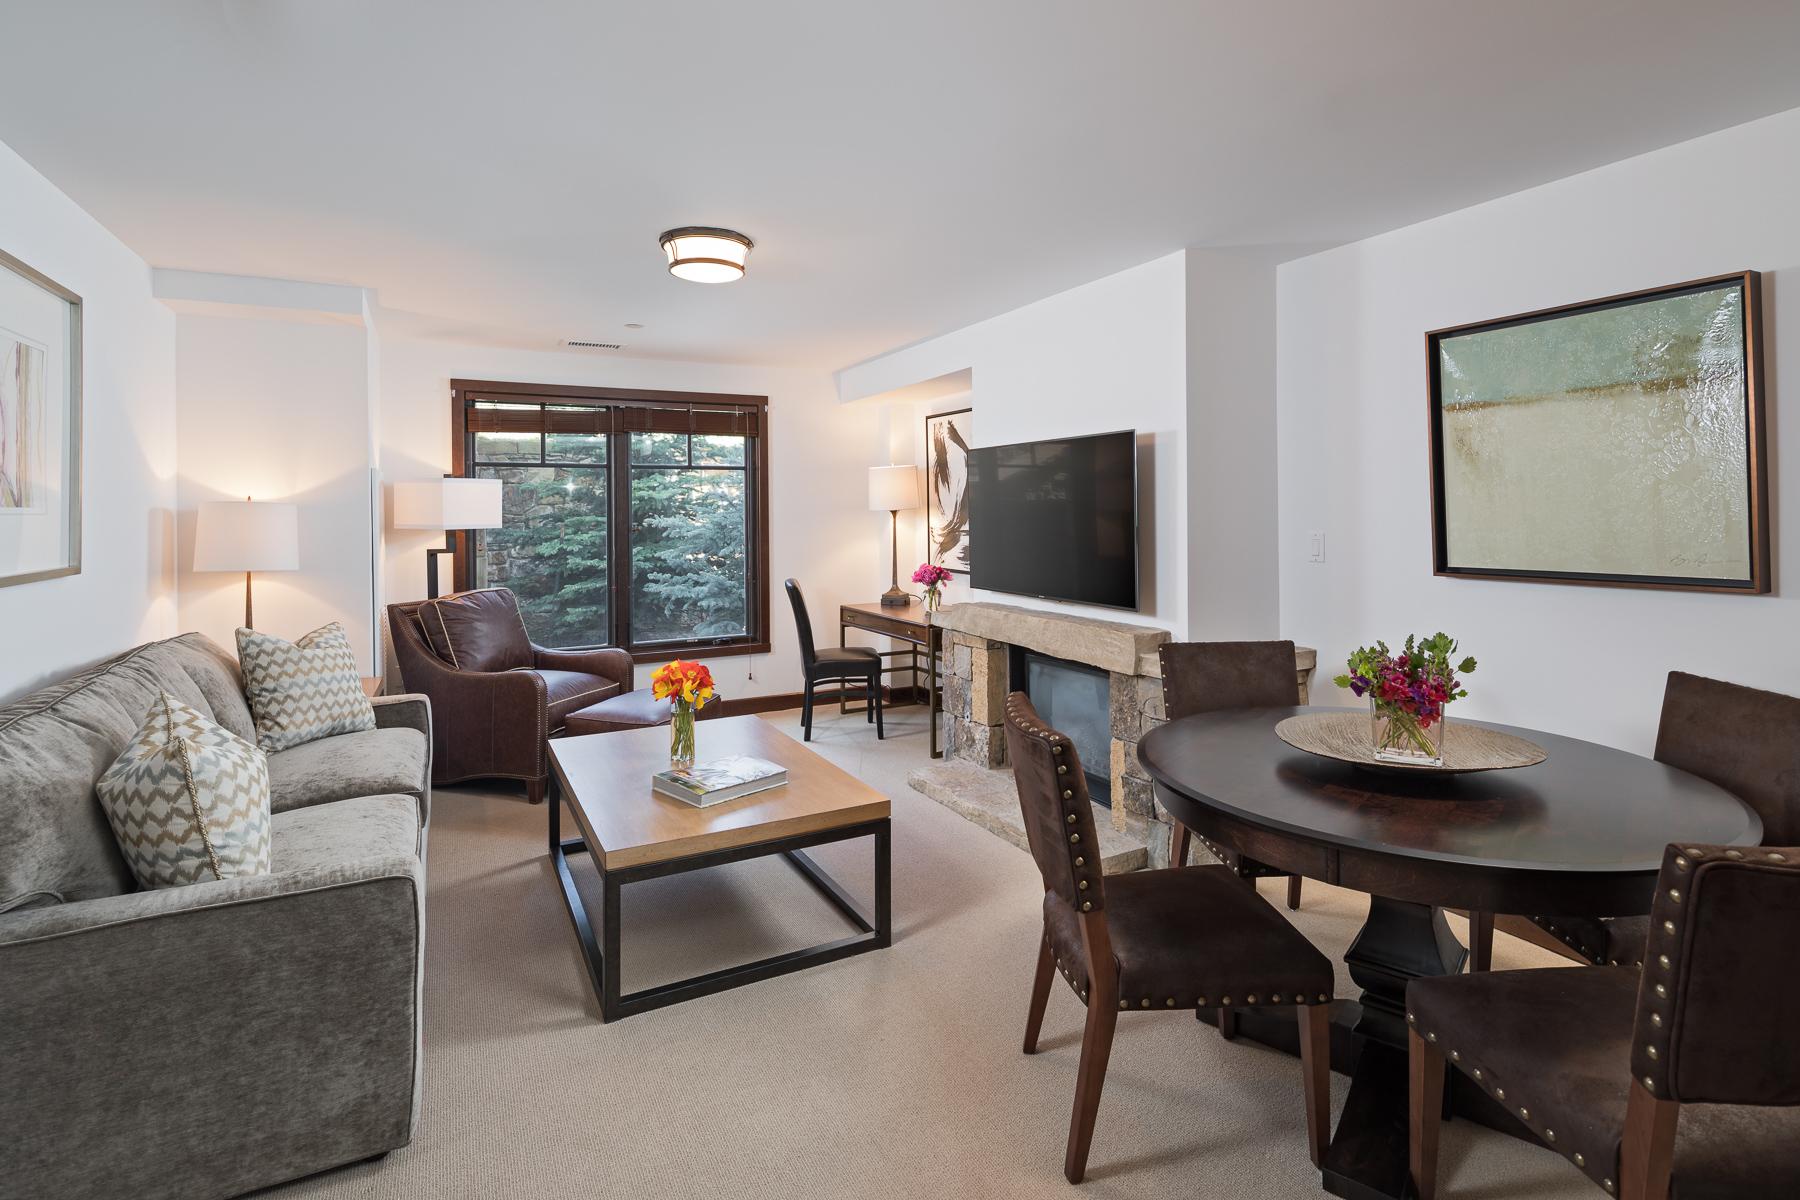 Nhà chung cư vì Bán tại Residence 1206, Madeline Hotel & Residences 568 Mountain Village Boulevard, Residence 1206 Telluride, Colorado, 81435 Hoa Kỳ